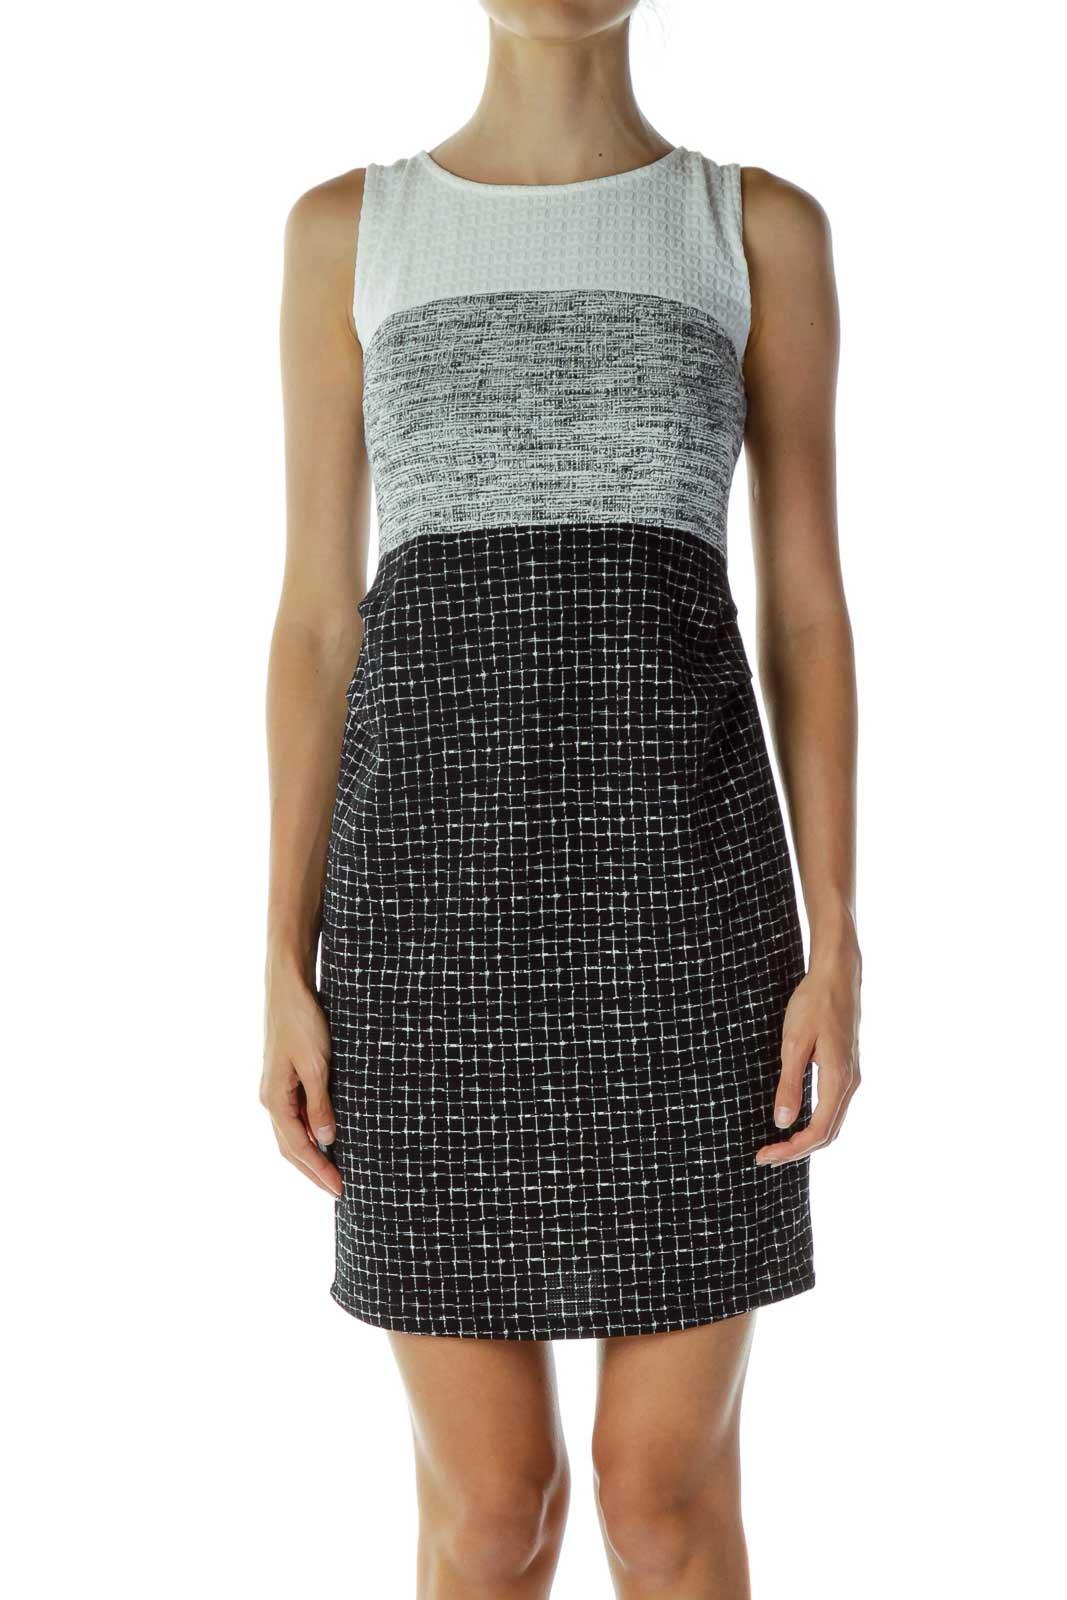 Black & White Checkered Dress Front